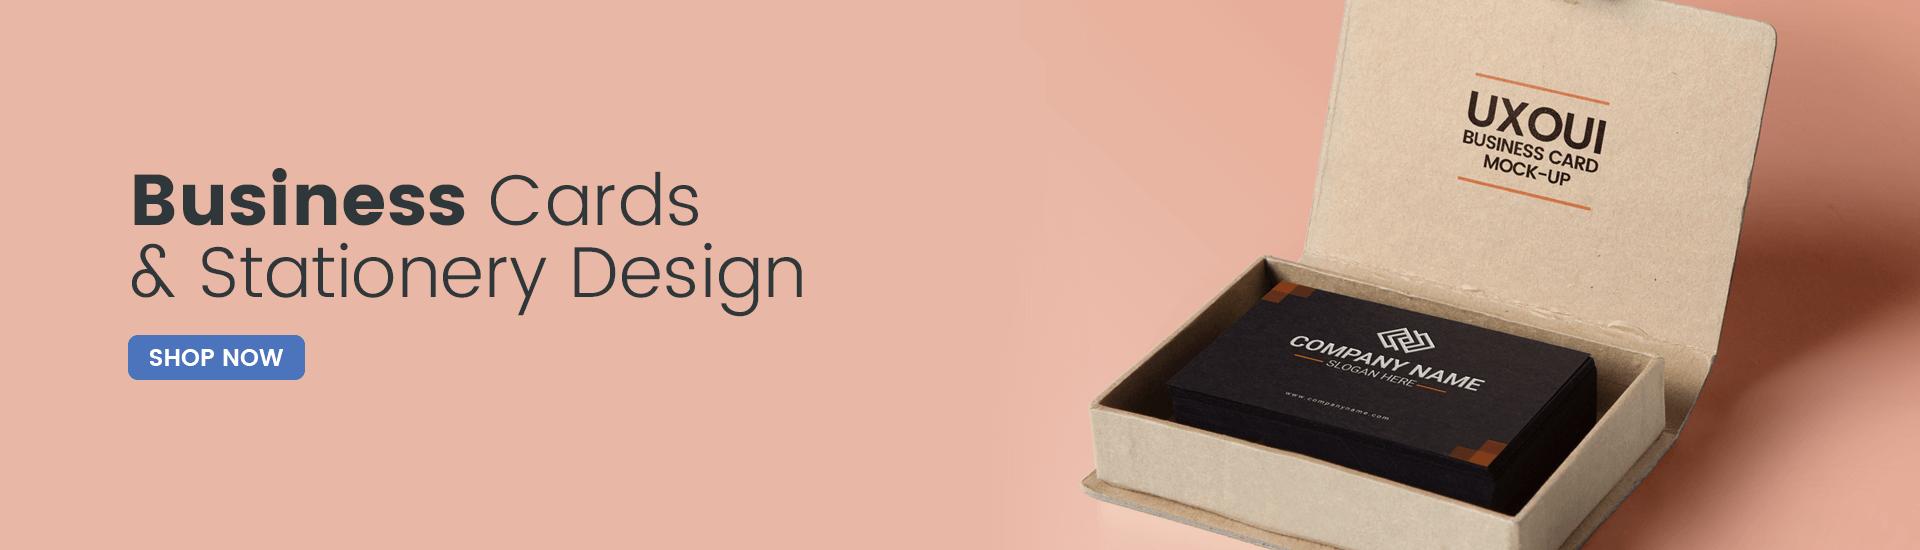 Uxoui Graphic Design Freelance Services Marketplace Hire